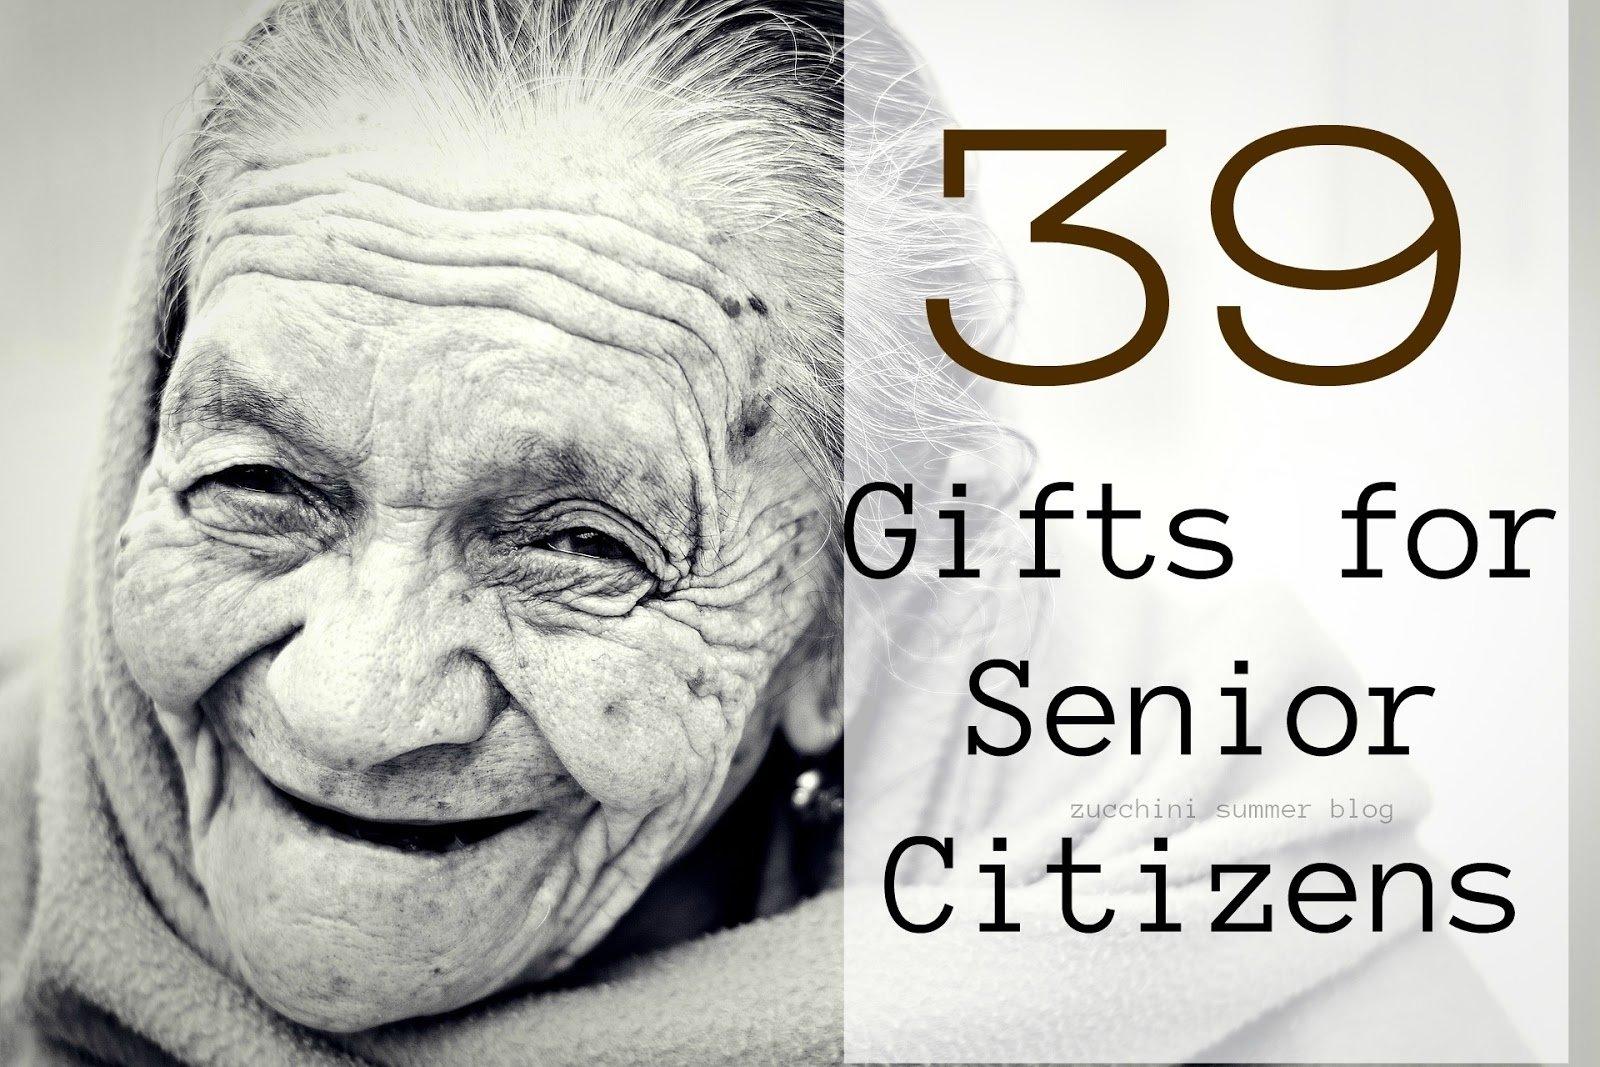 10 Pretty Gift Ideas For Senior Citizens zucchini summer gifts for senior citizens 2021